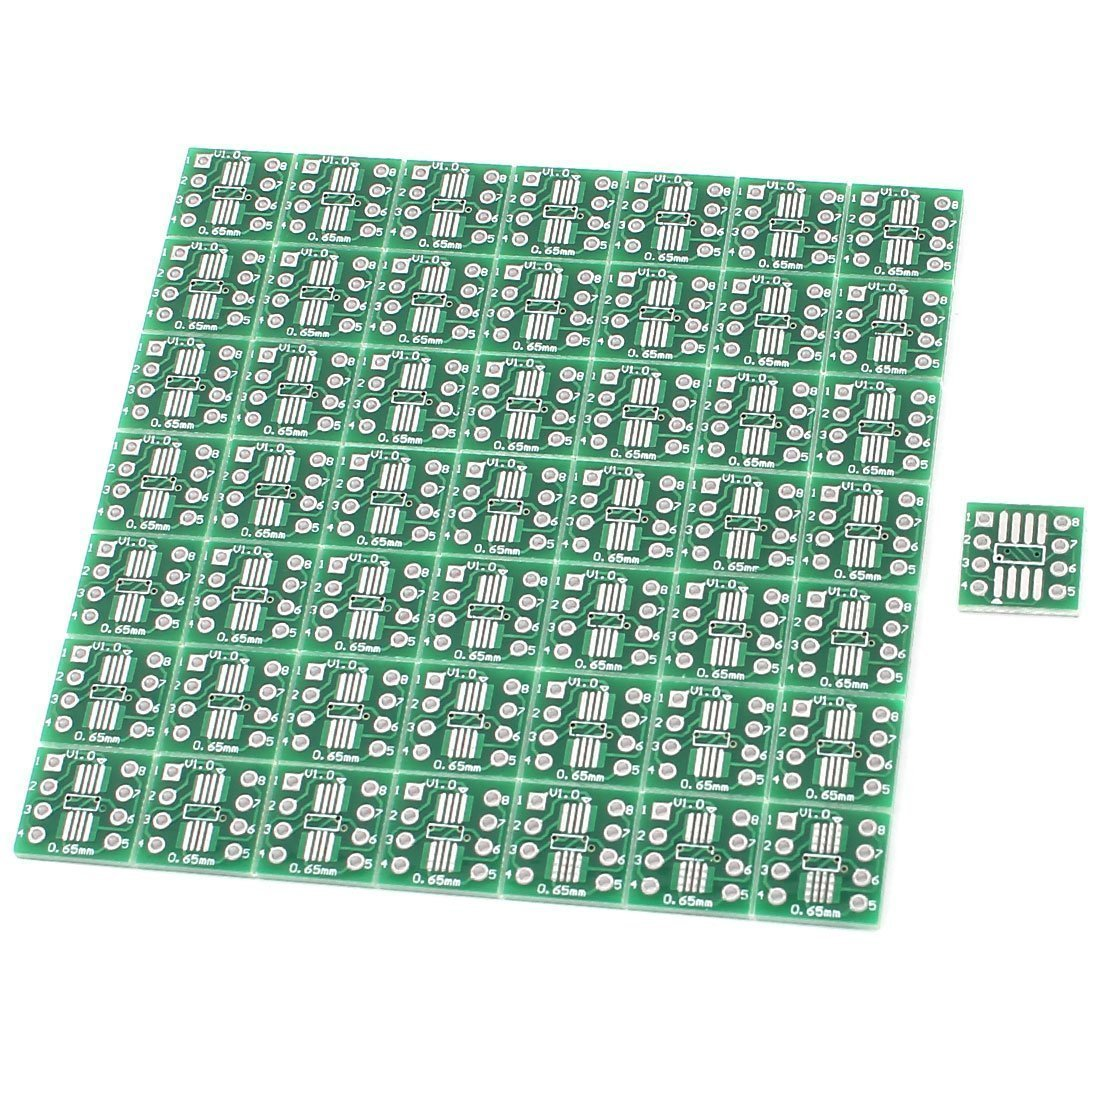 50Pcs SOP8 SSOP8 TSSOP8 SMD To DIP8 Adapter 0.65//1.27mm PCB Board